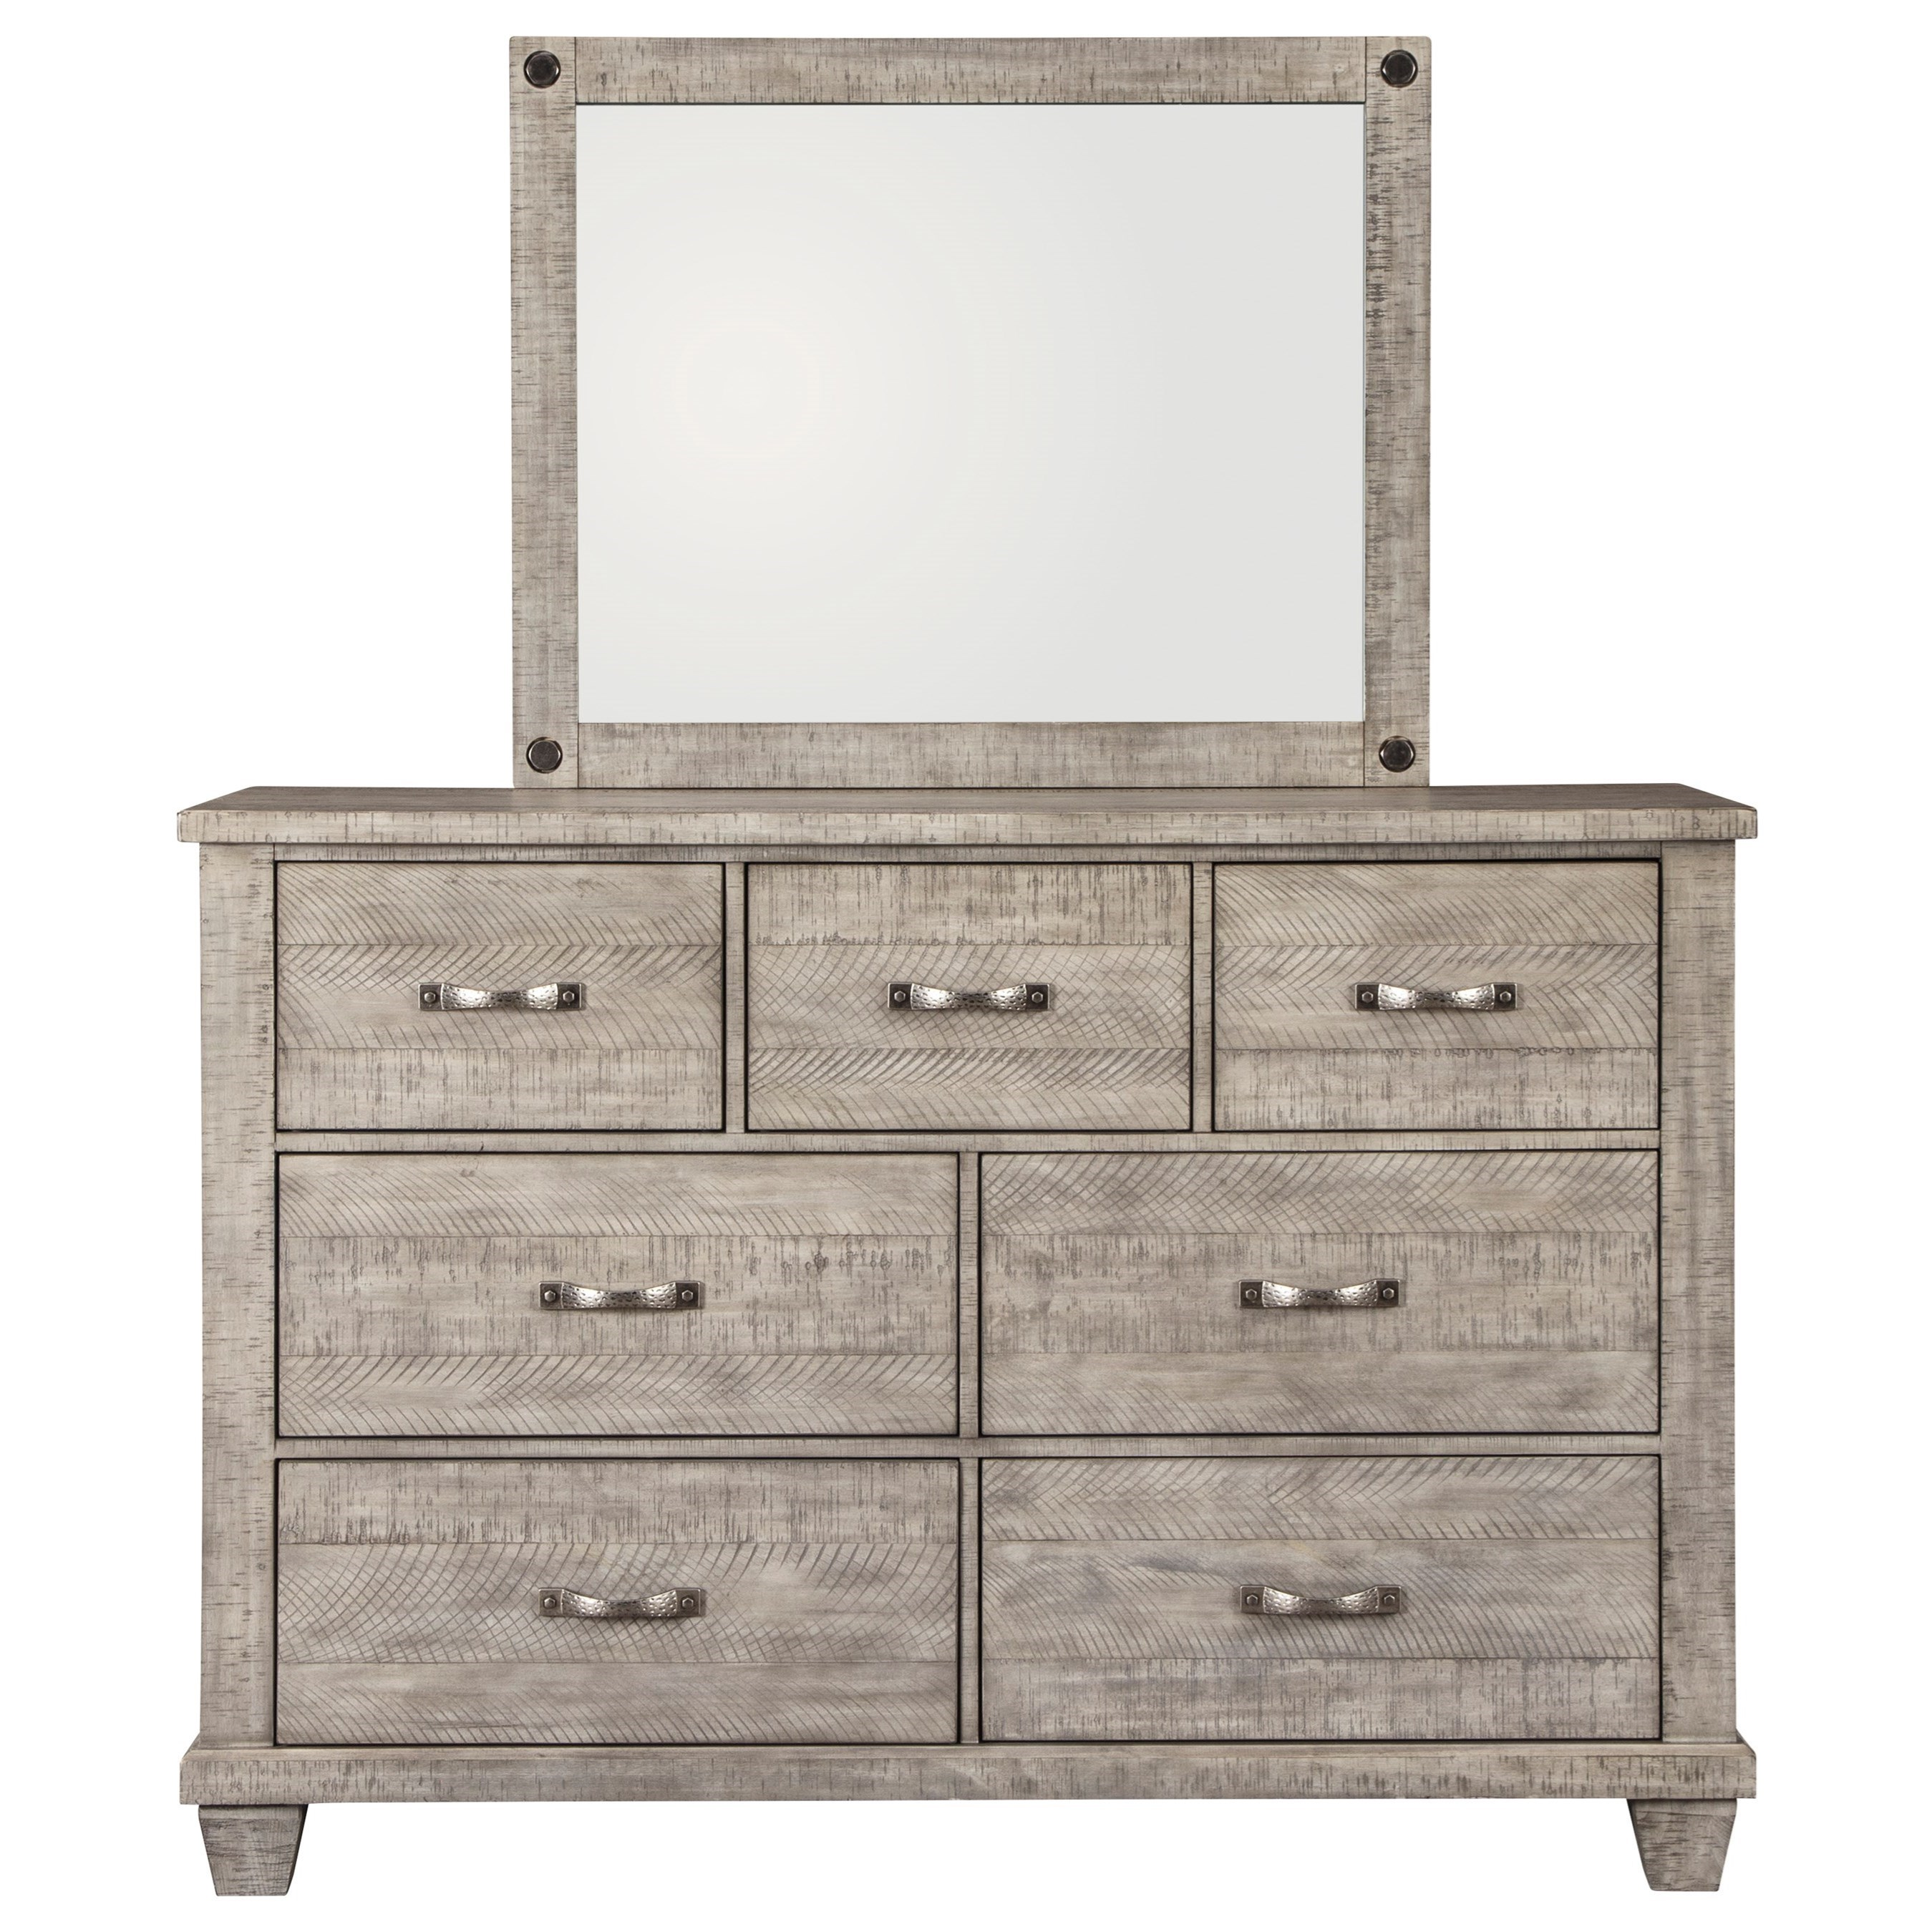 Naydell Dresser & Bedroom Mirror by Benchcraft at Walker's Furniture